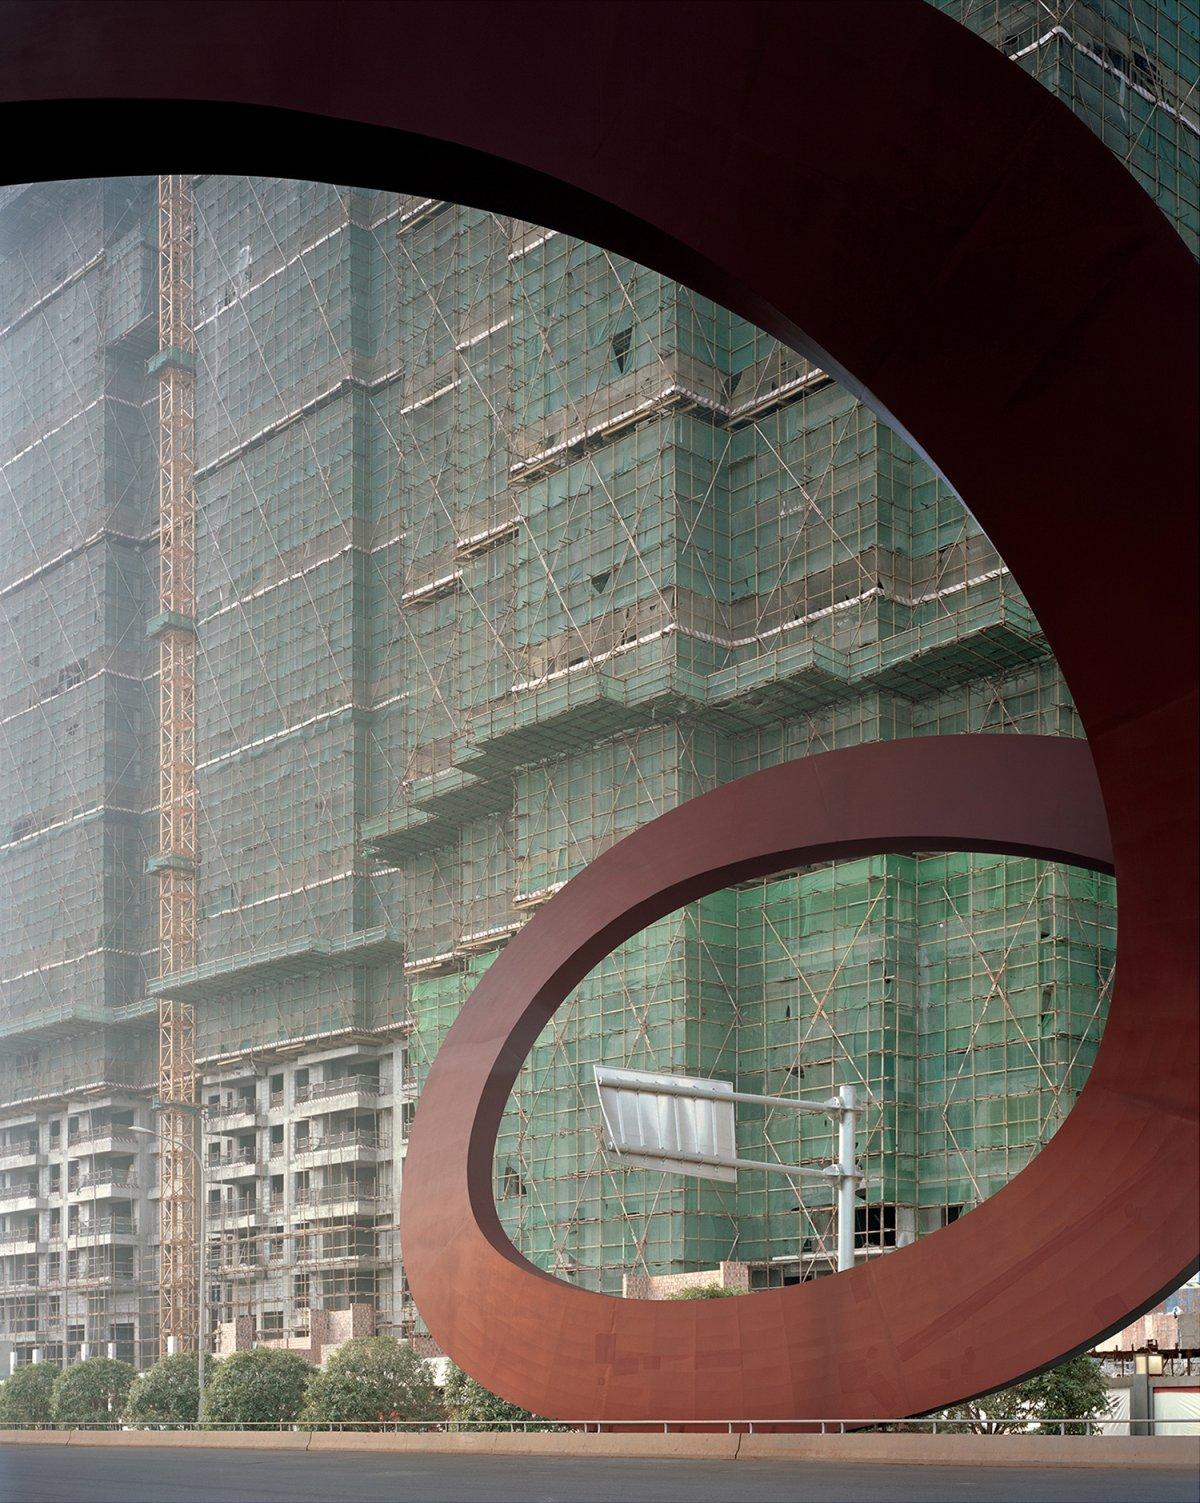 Cina, città fantasma, Kai Caemmerer